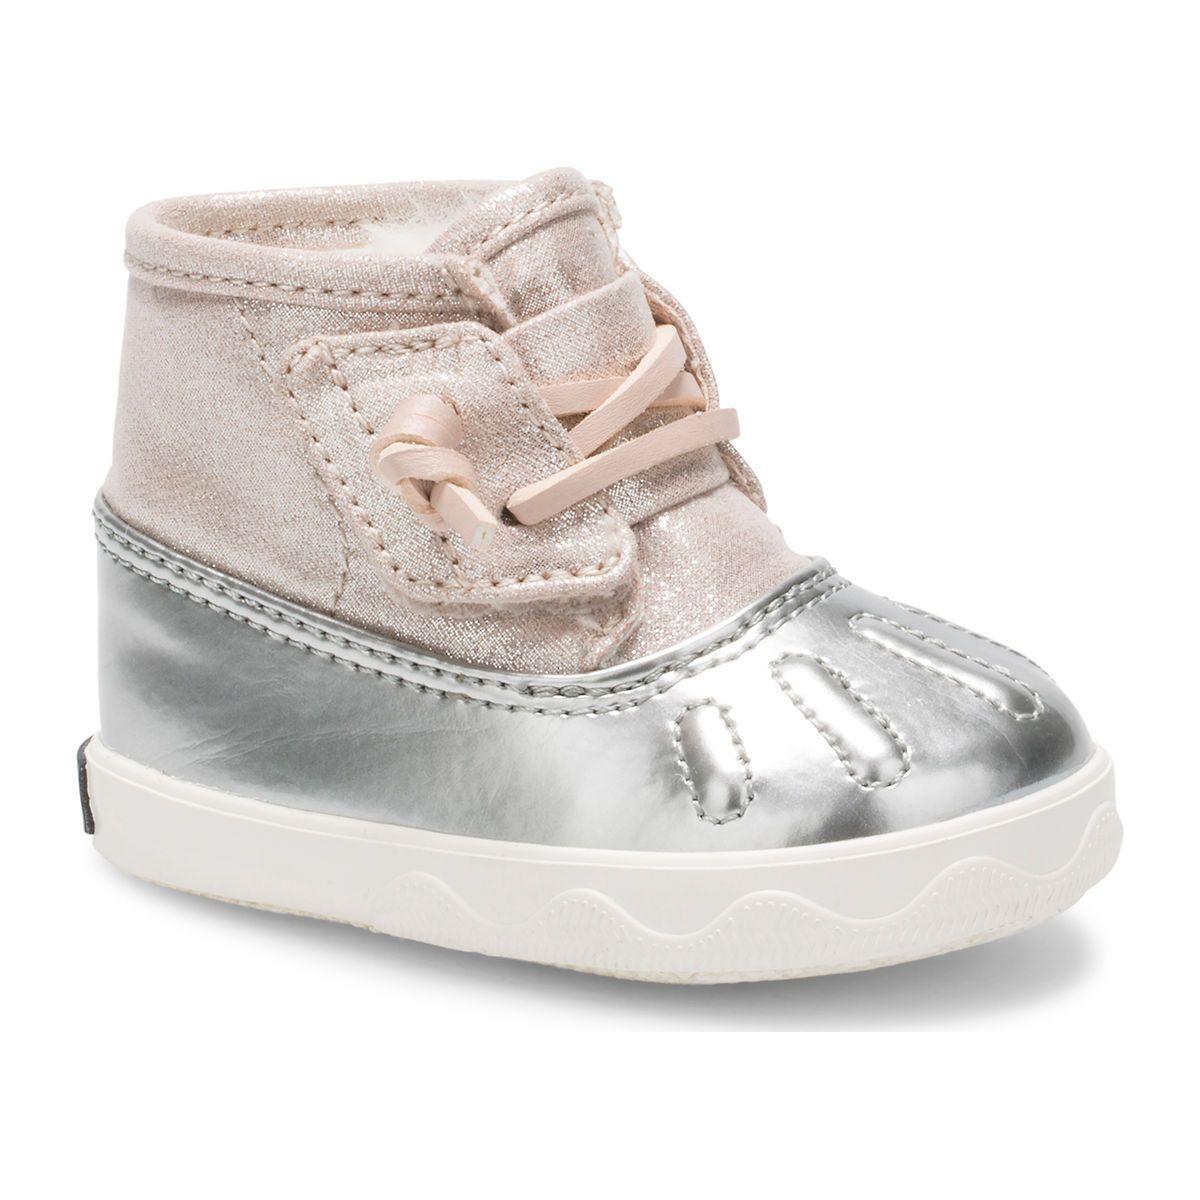 SPERRY Kids Icestorm Crib Fashion Boot